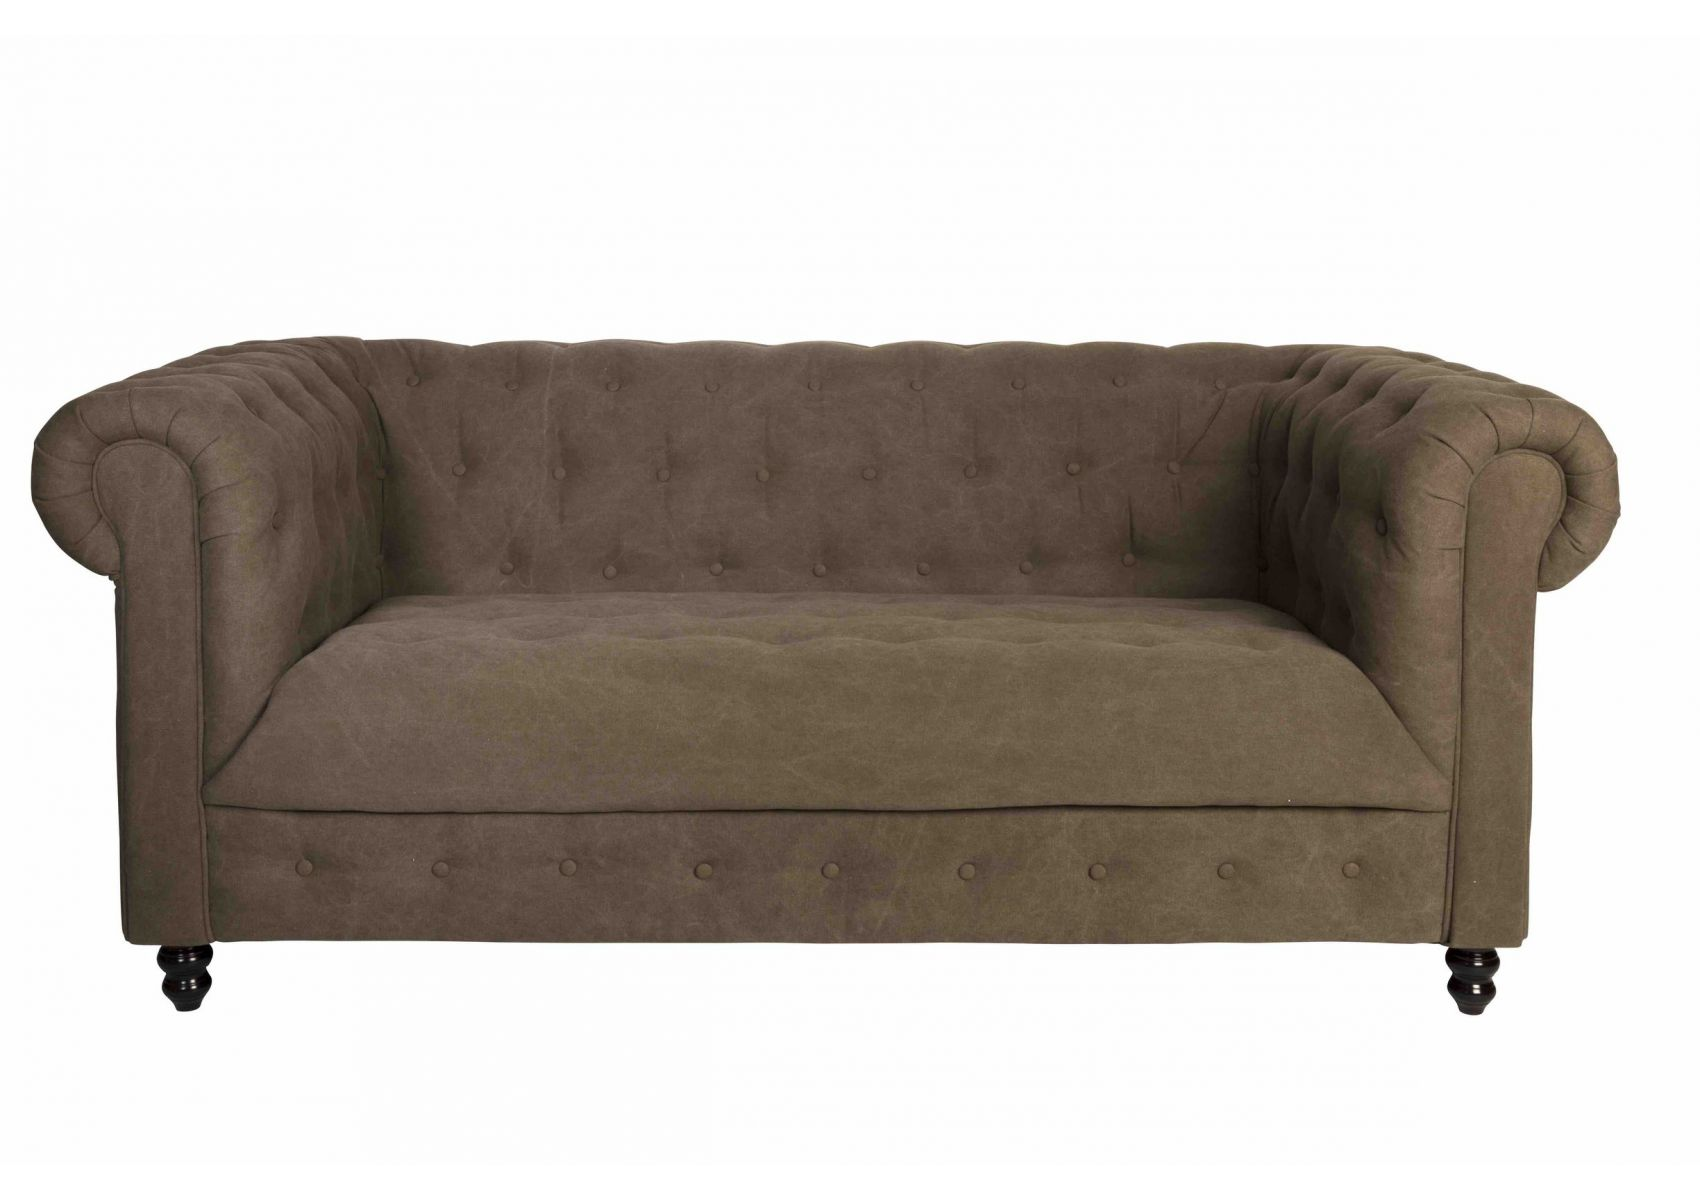 canap design en tissu de la collection chesterfield de. Black Bedroom Furniture Sets. Home Design Ideas